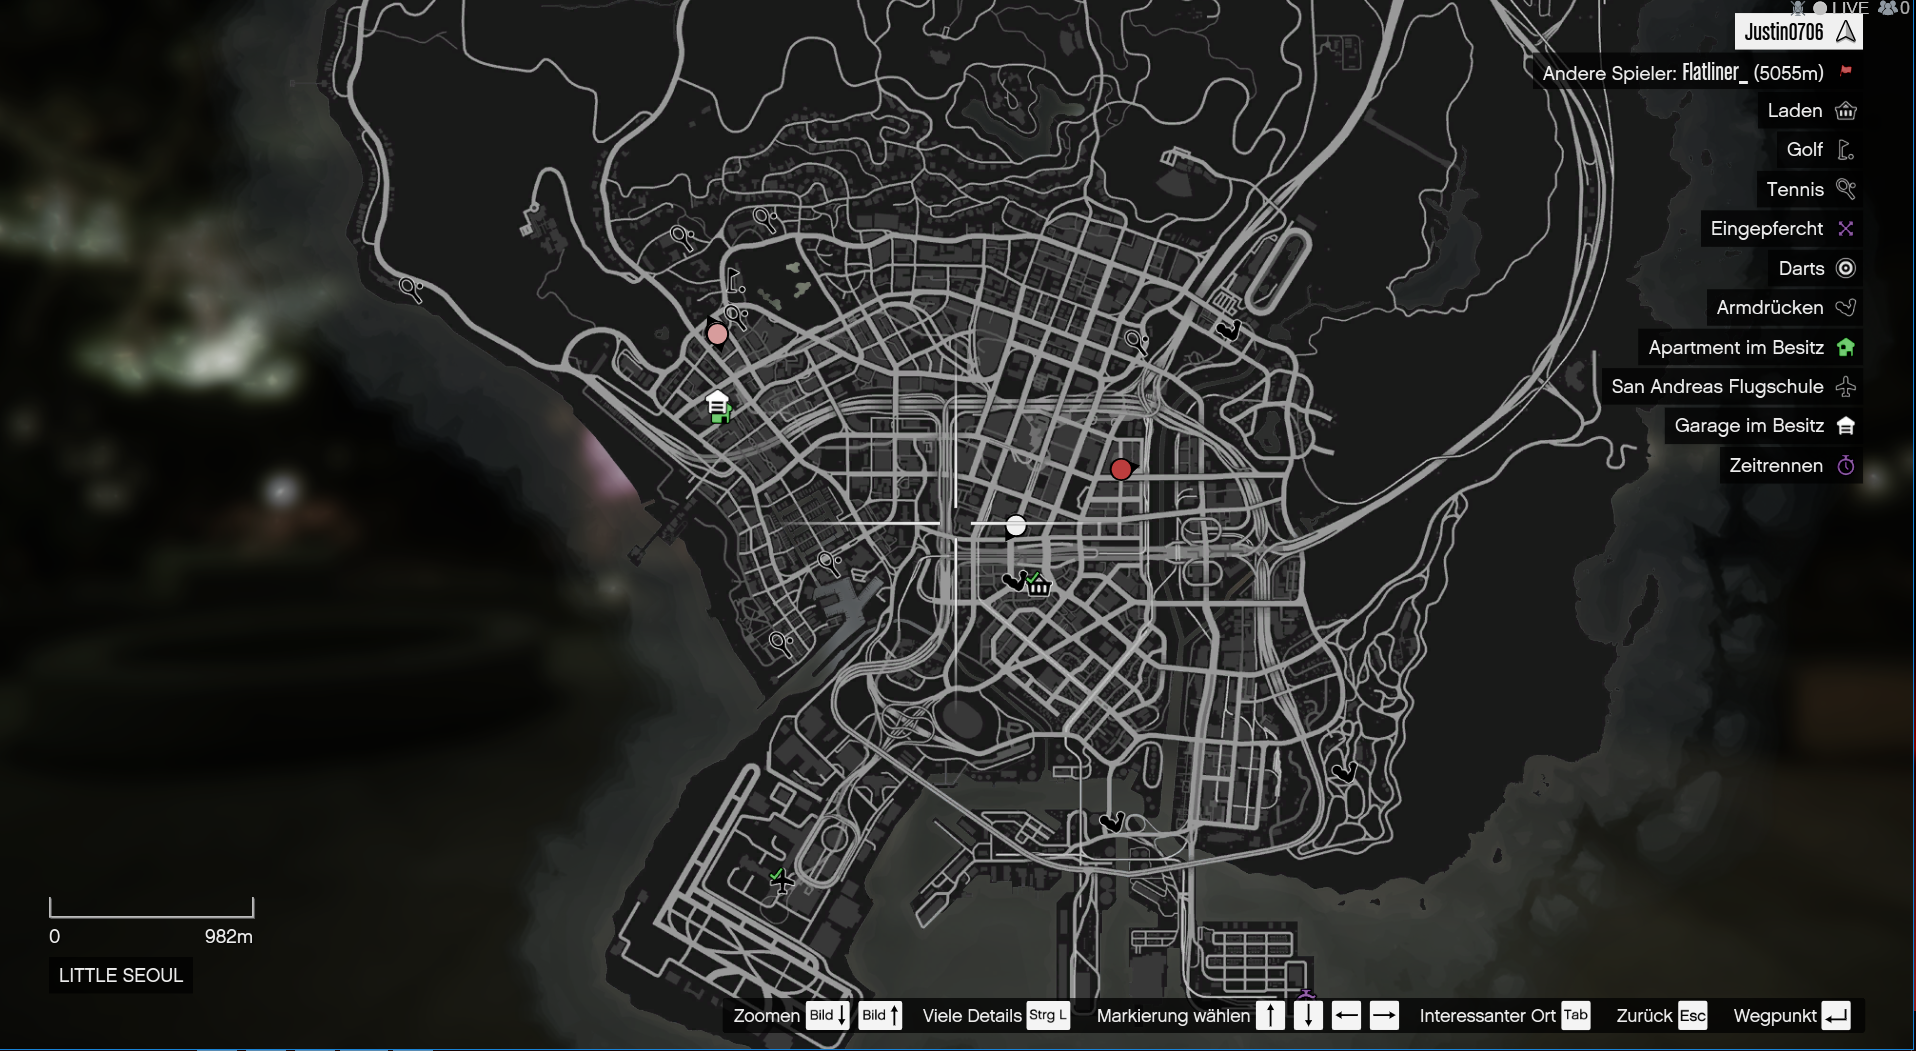 Gta Online Karte